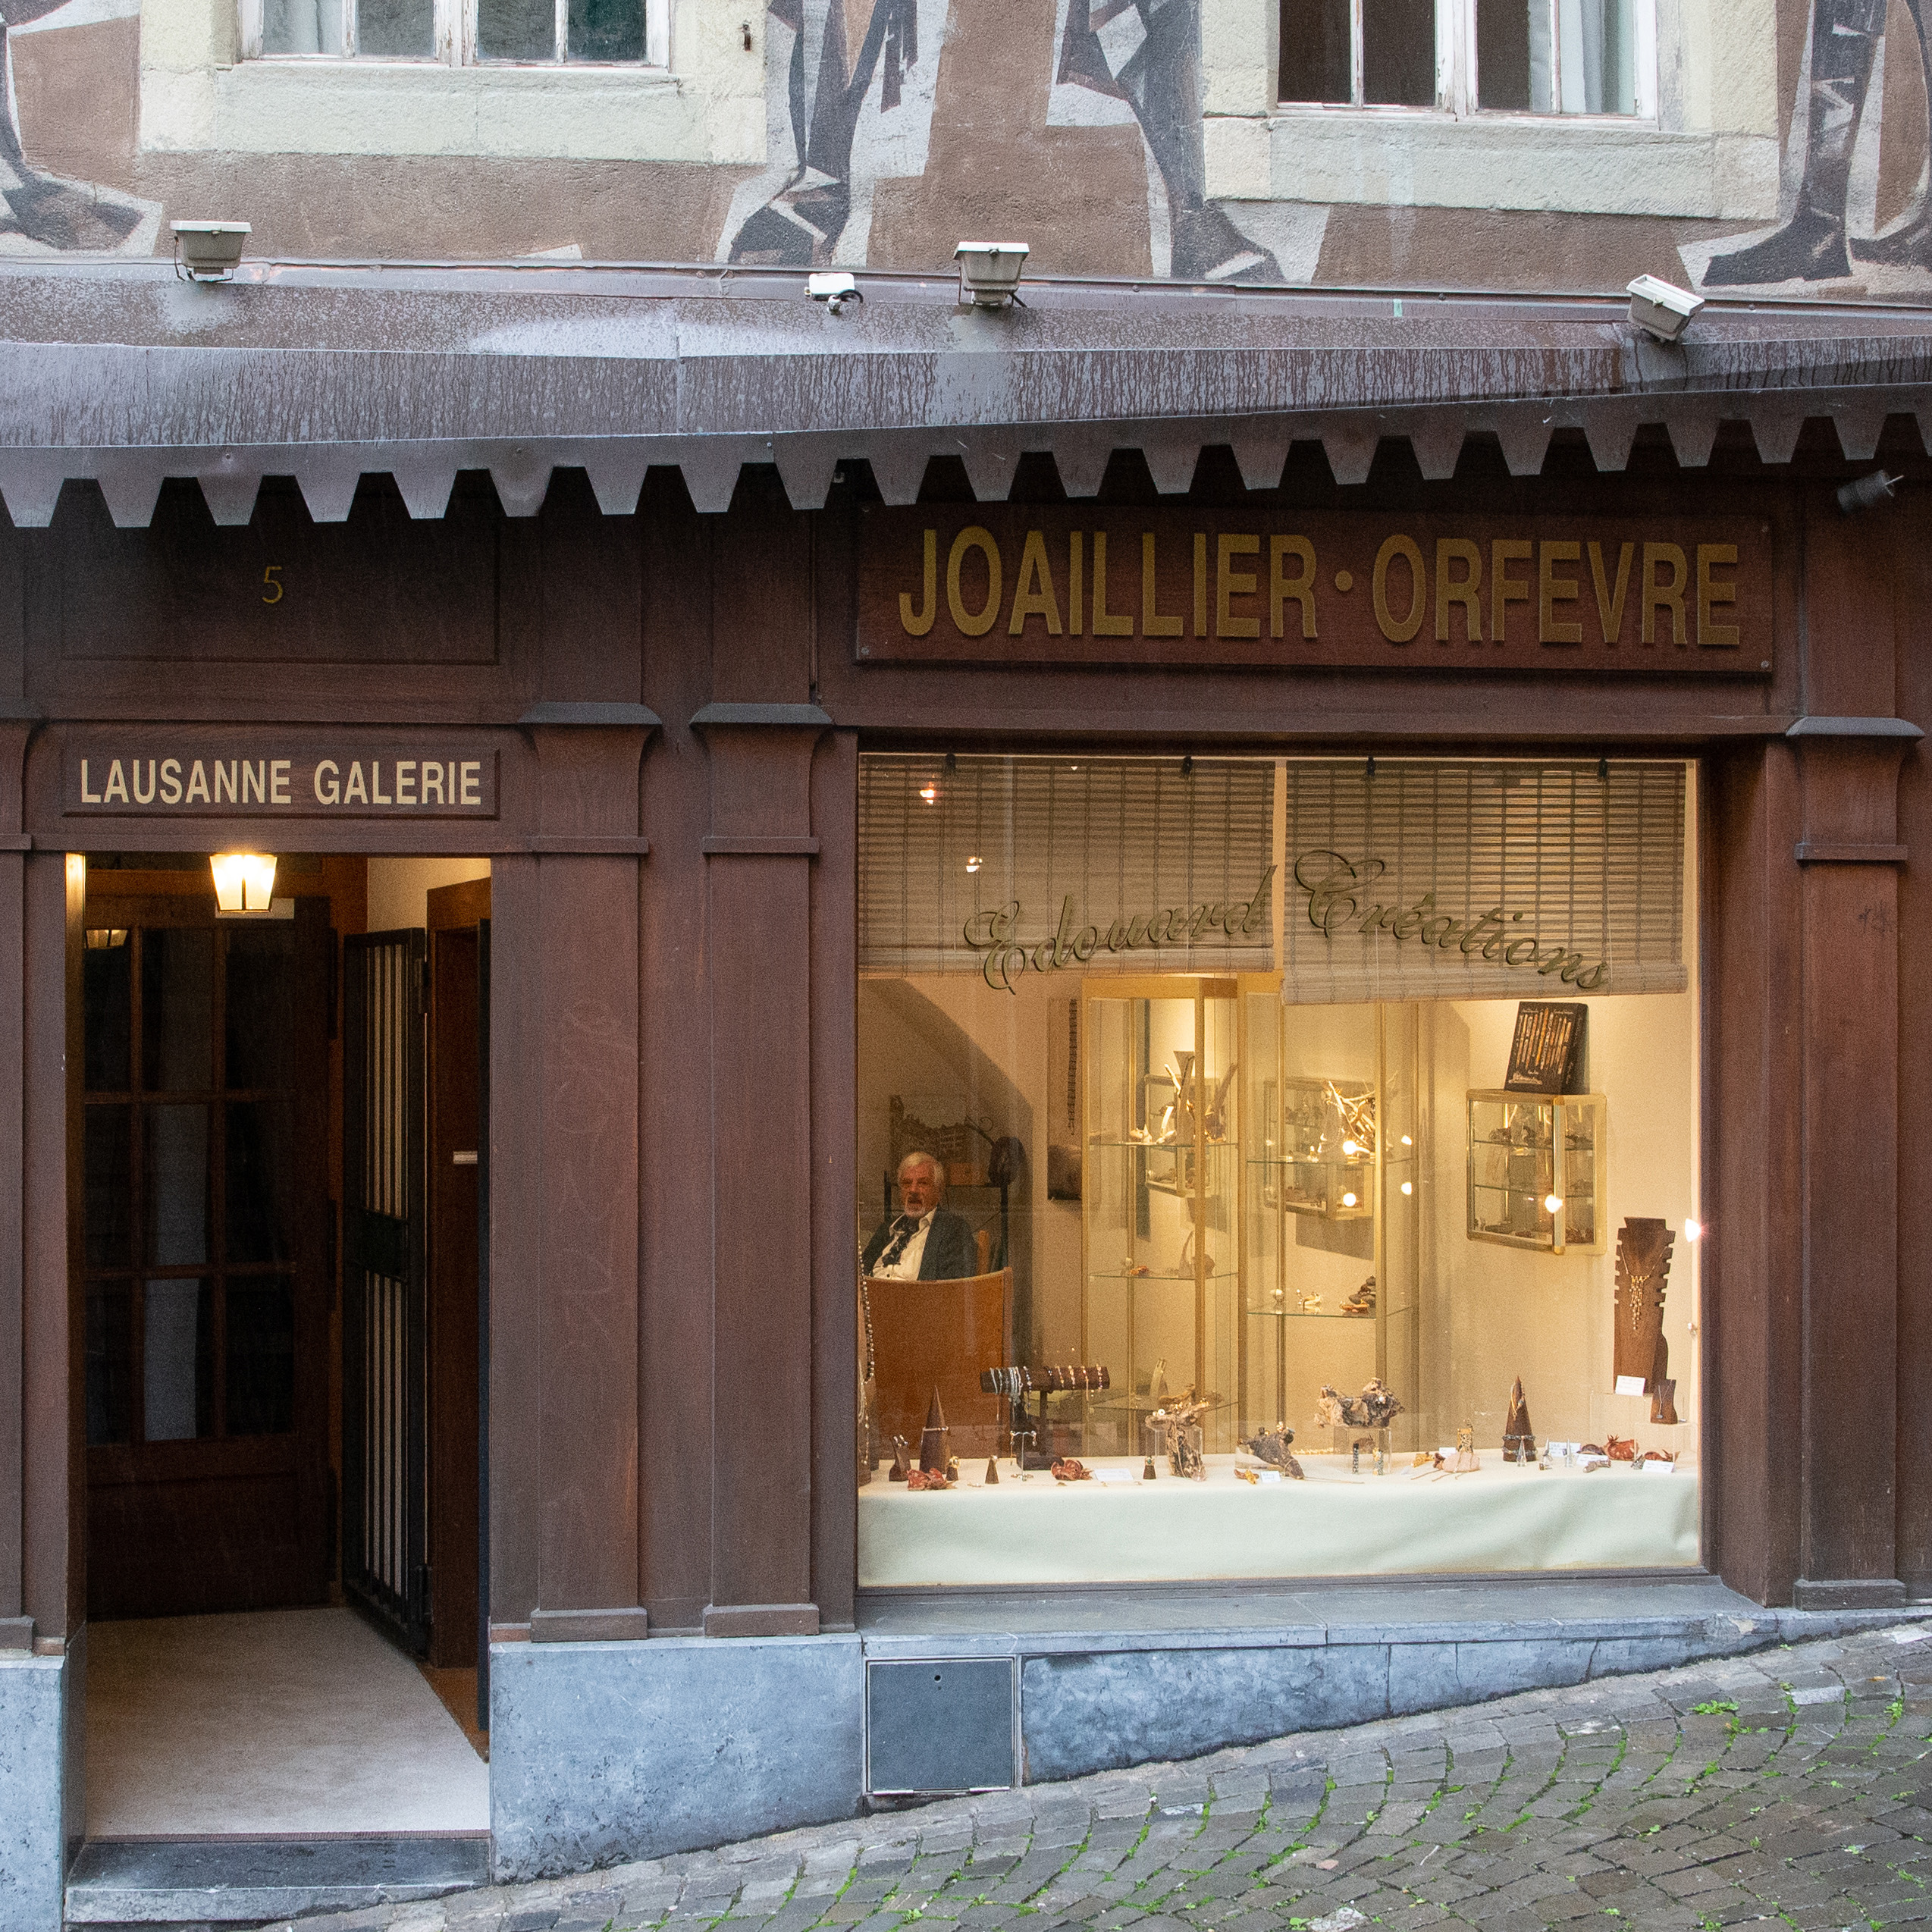 Lausanne_Galerie_1[1]